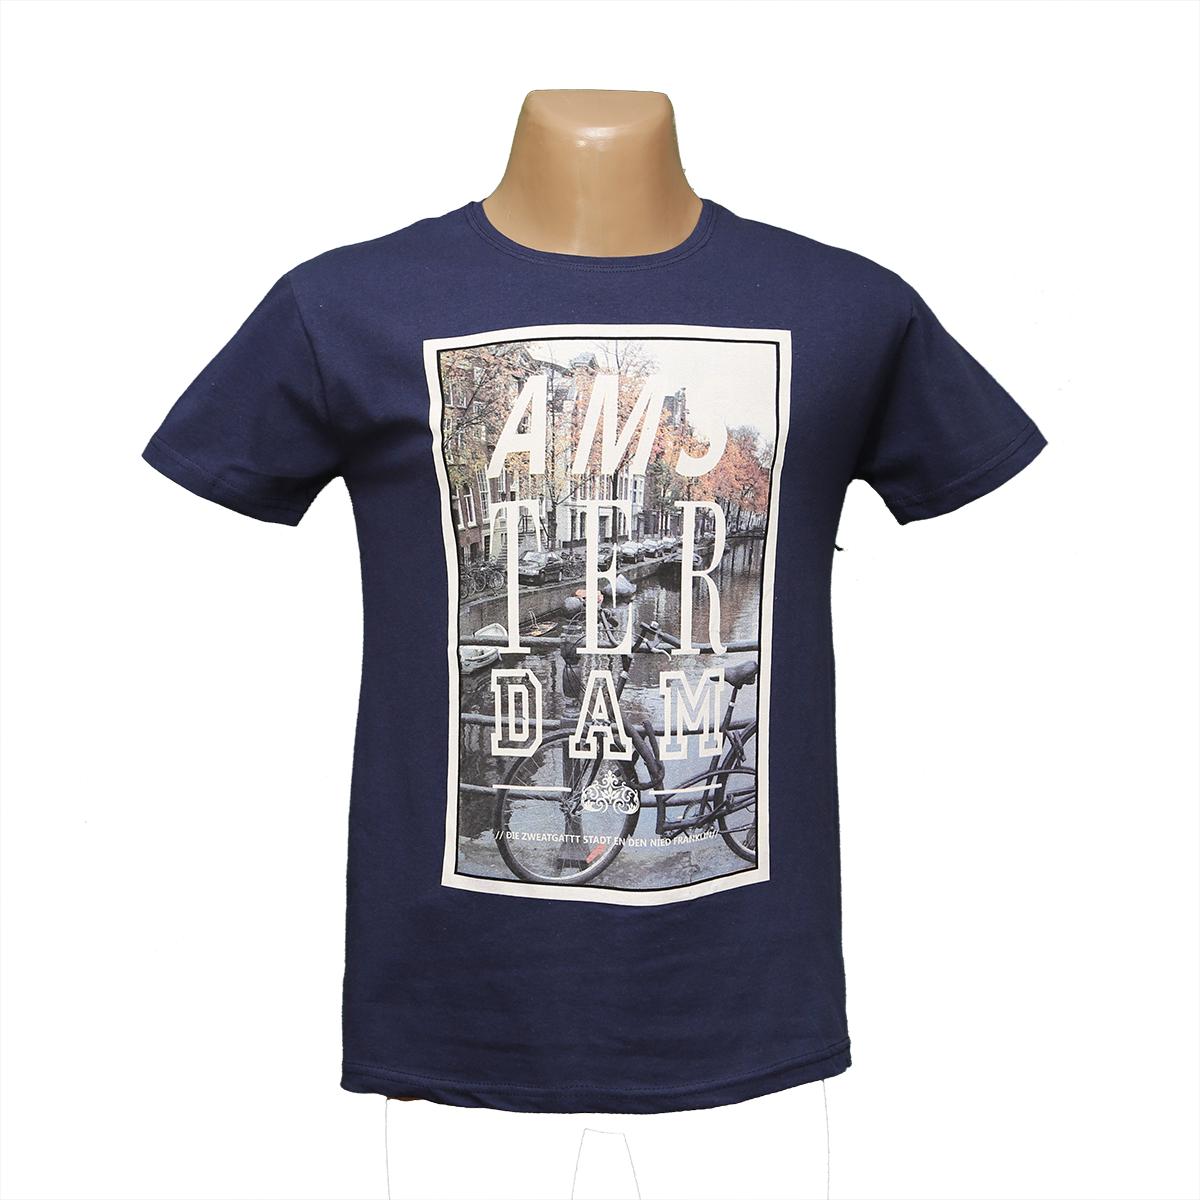 Молодежная футболка по низким ценам Турция 2487